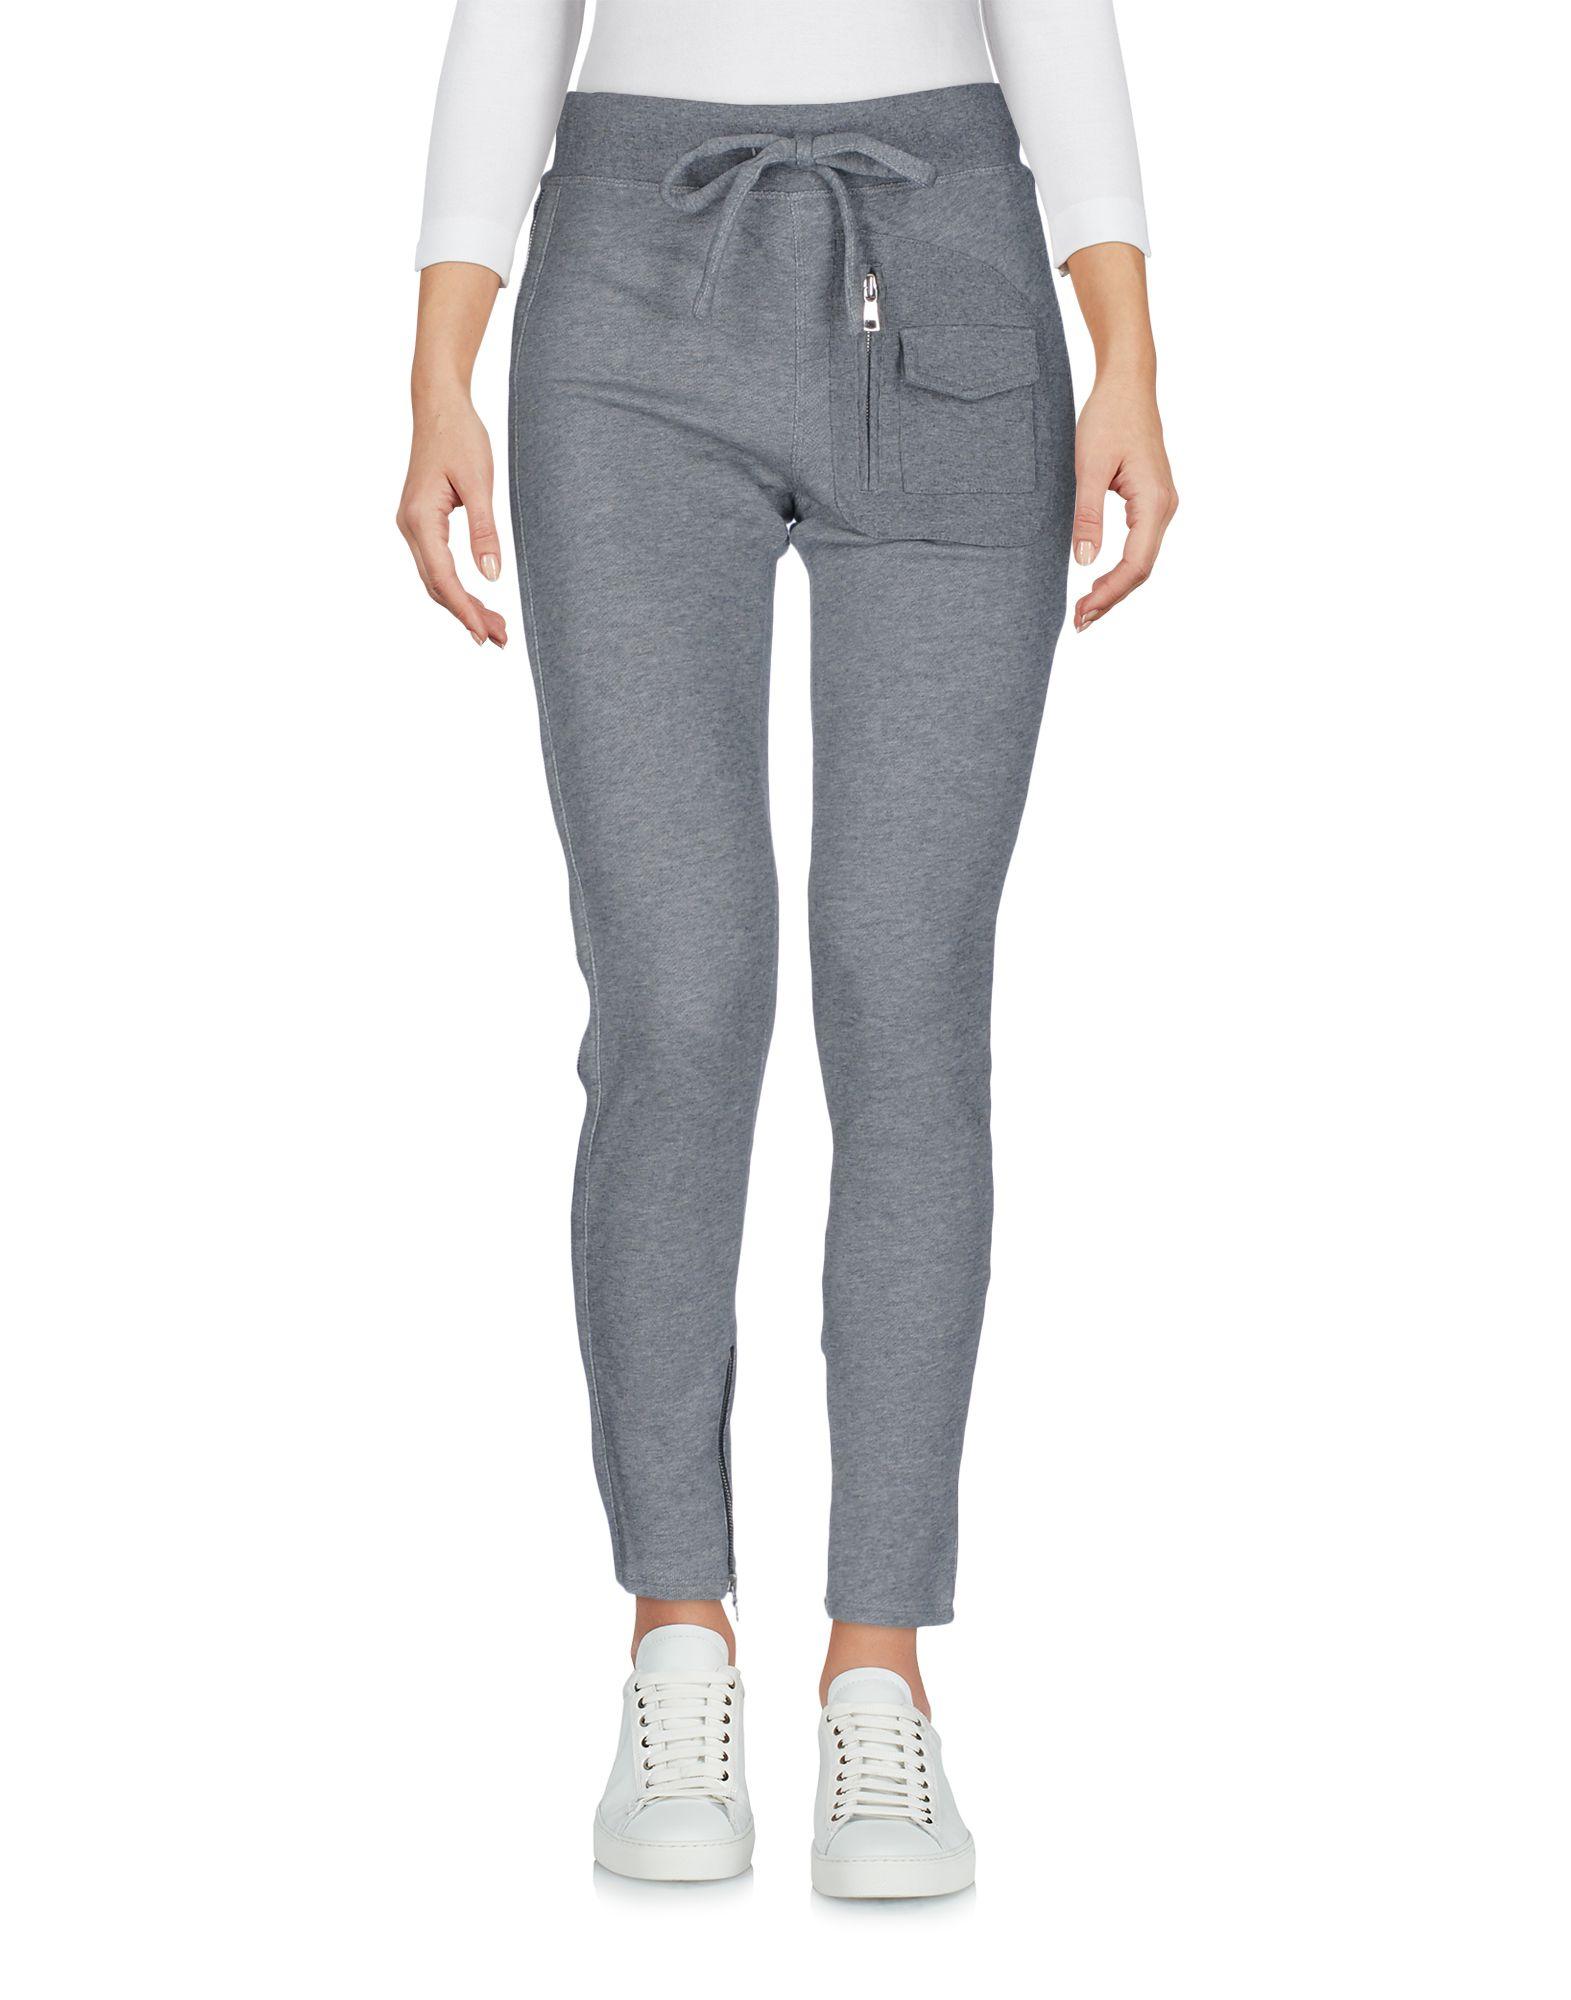 Pantalone Rta Donna - Acquista online su IIcRWueF9Y